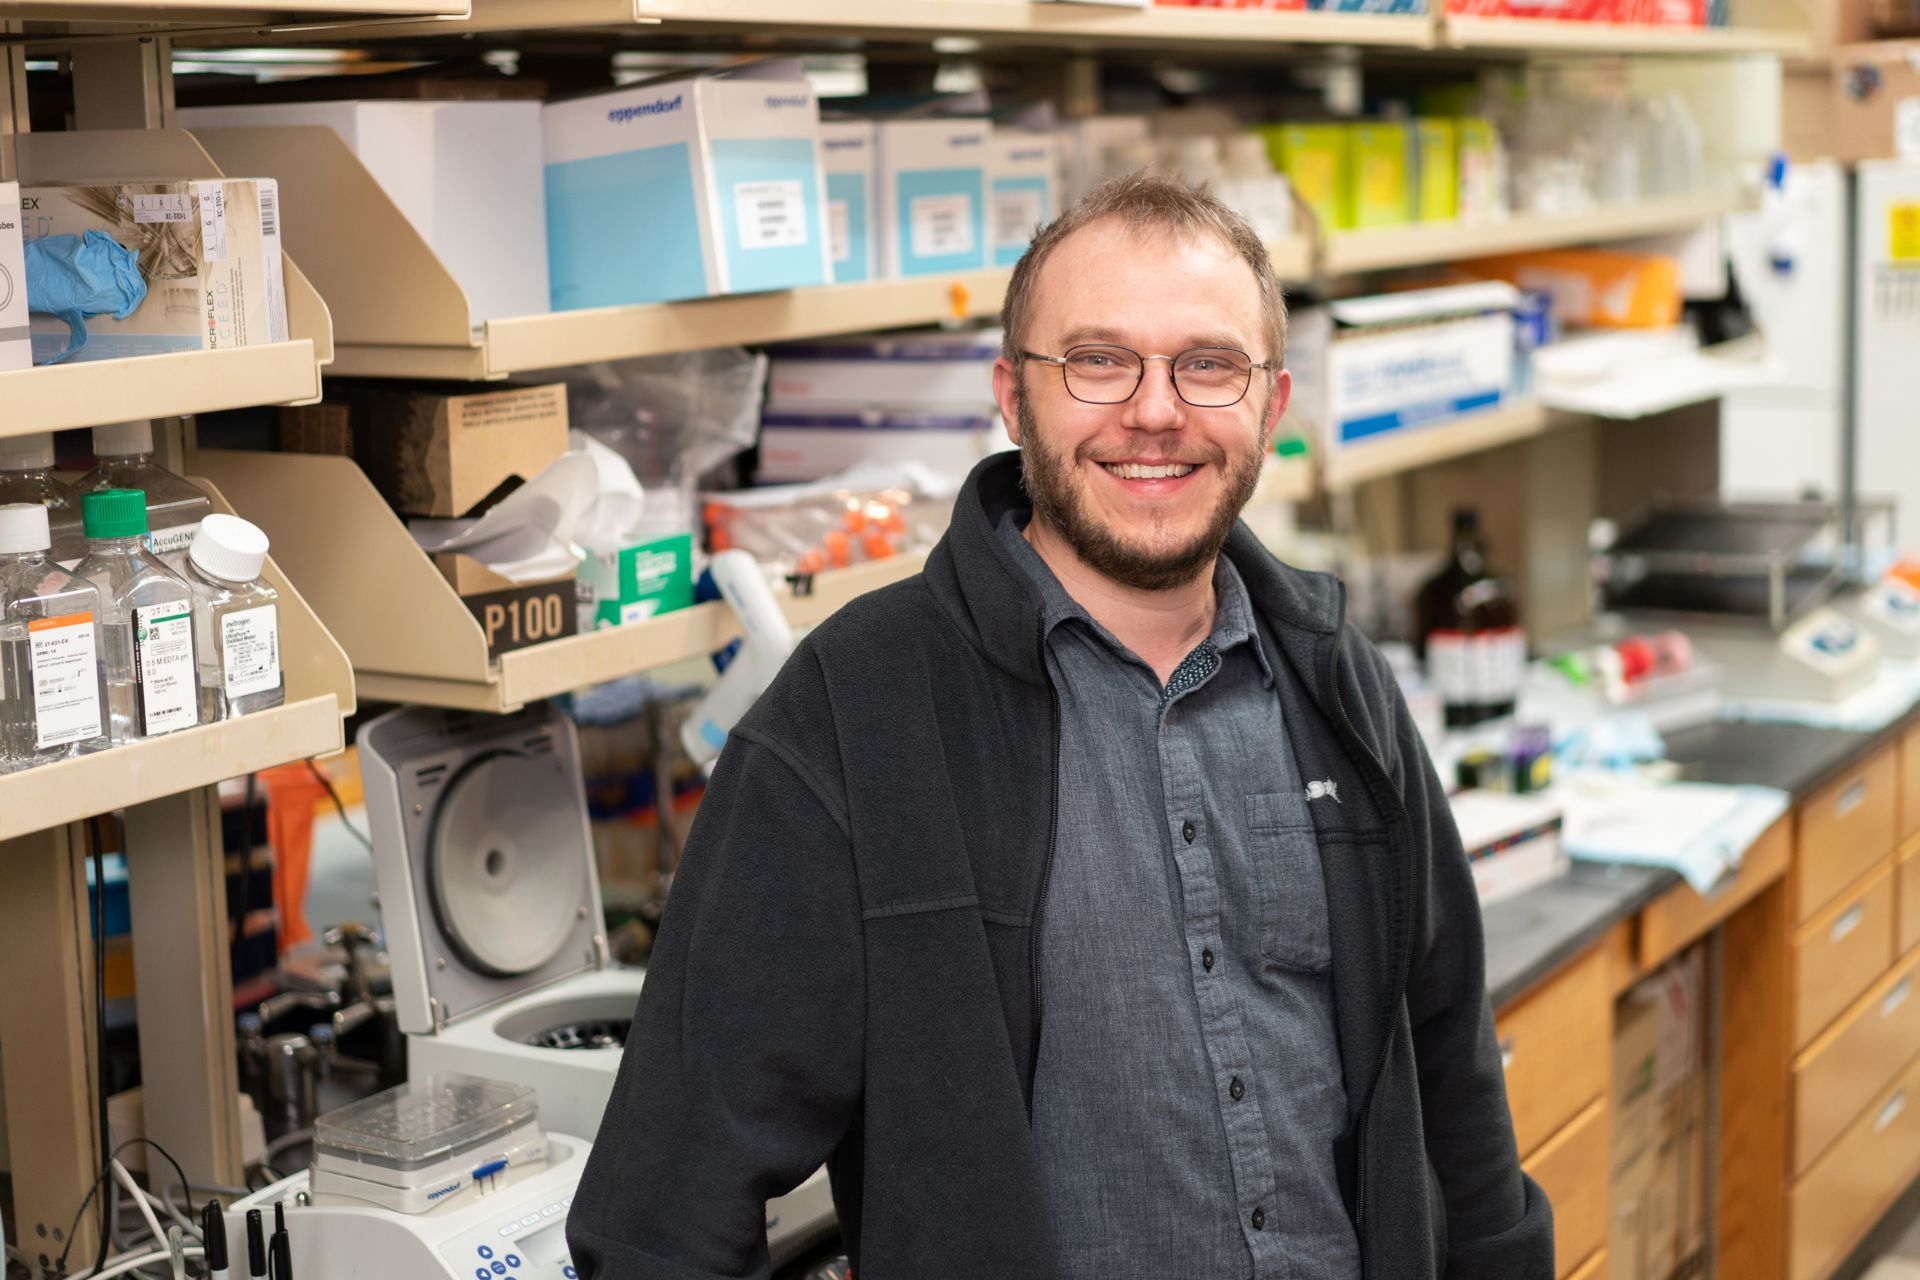 Christophe Lechauve, PhD